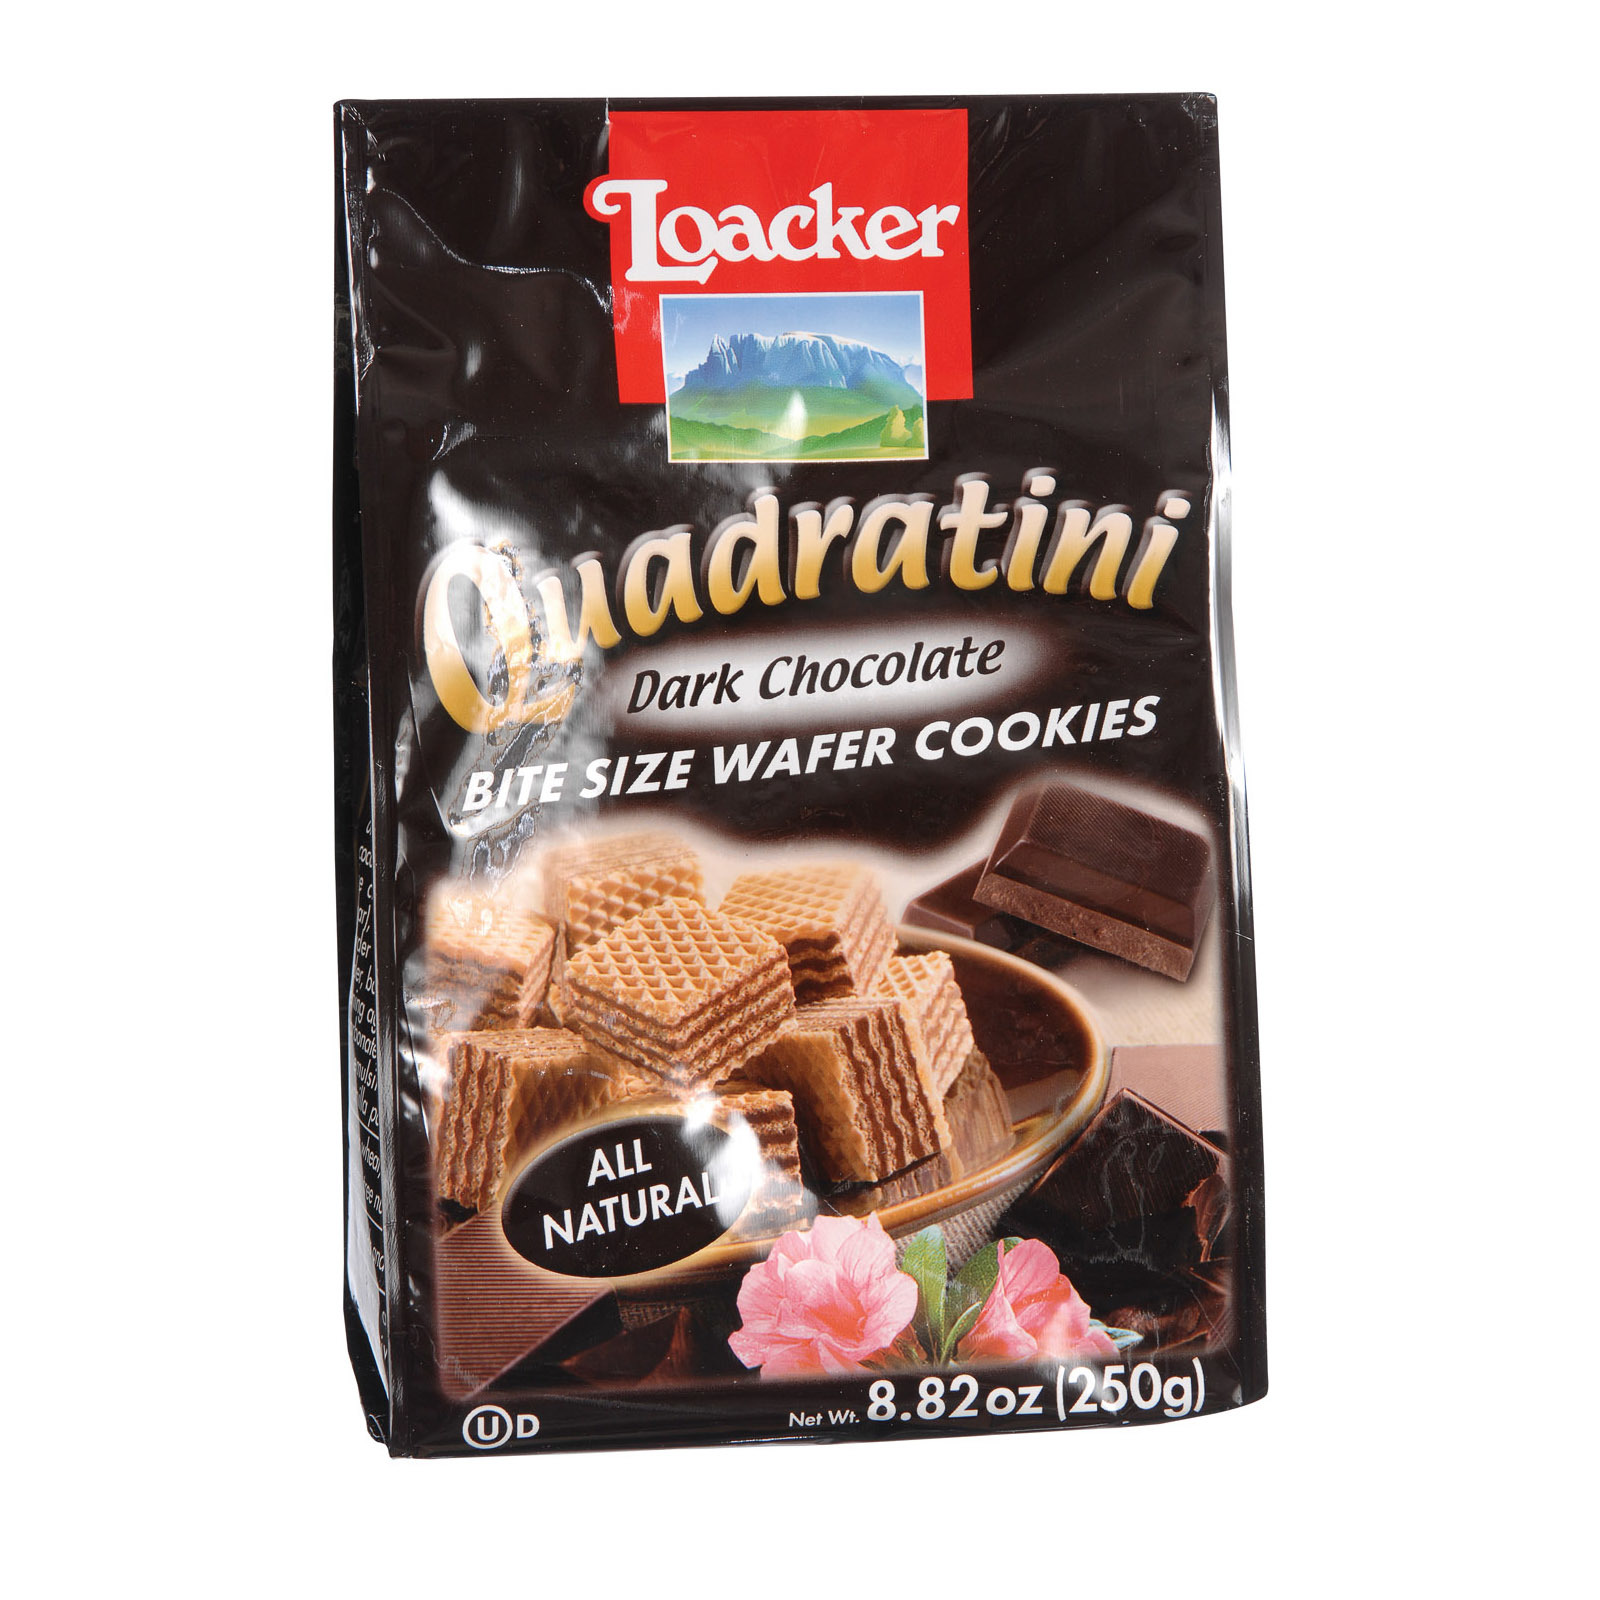 Loacker Quadratini Dark Chocolate Quadratini Bite Size Wafer Cookies - Case of 8 - 8.82 oz.